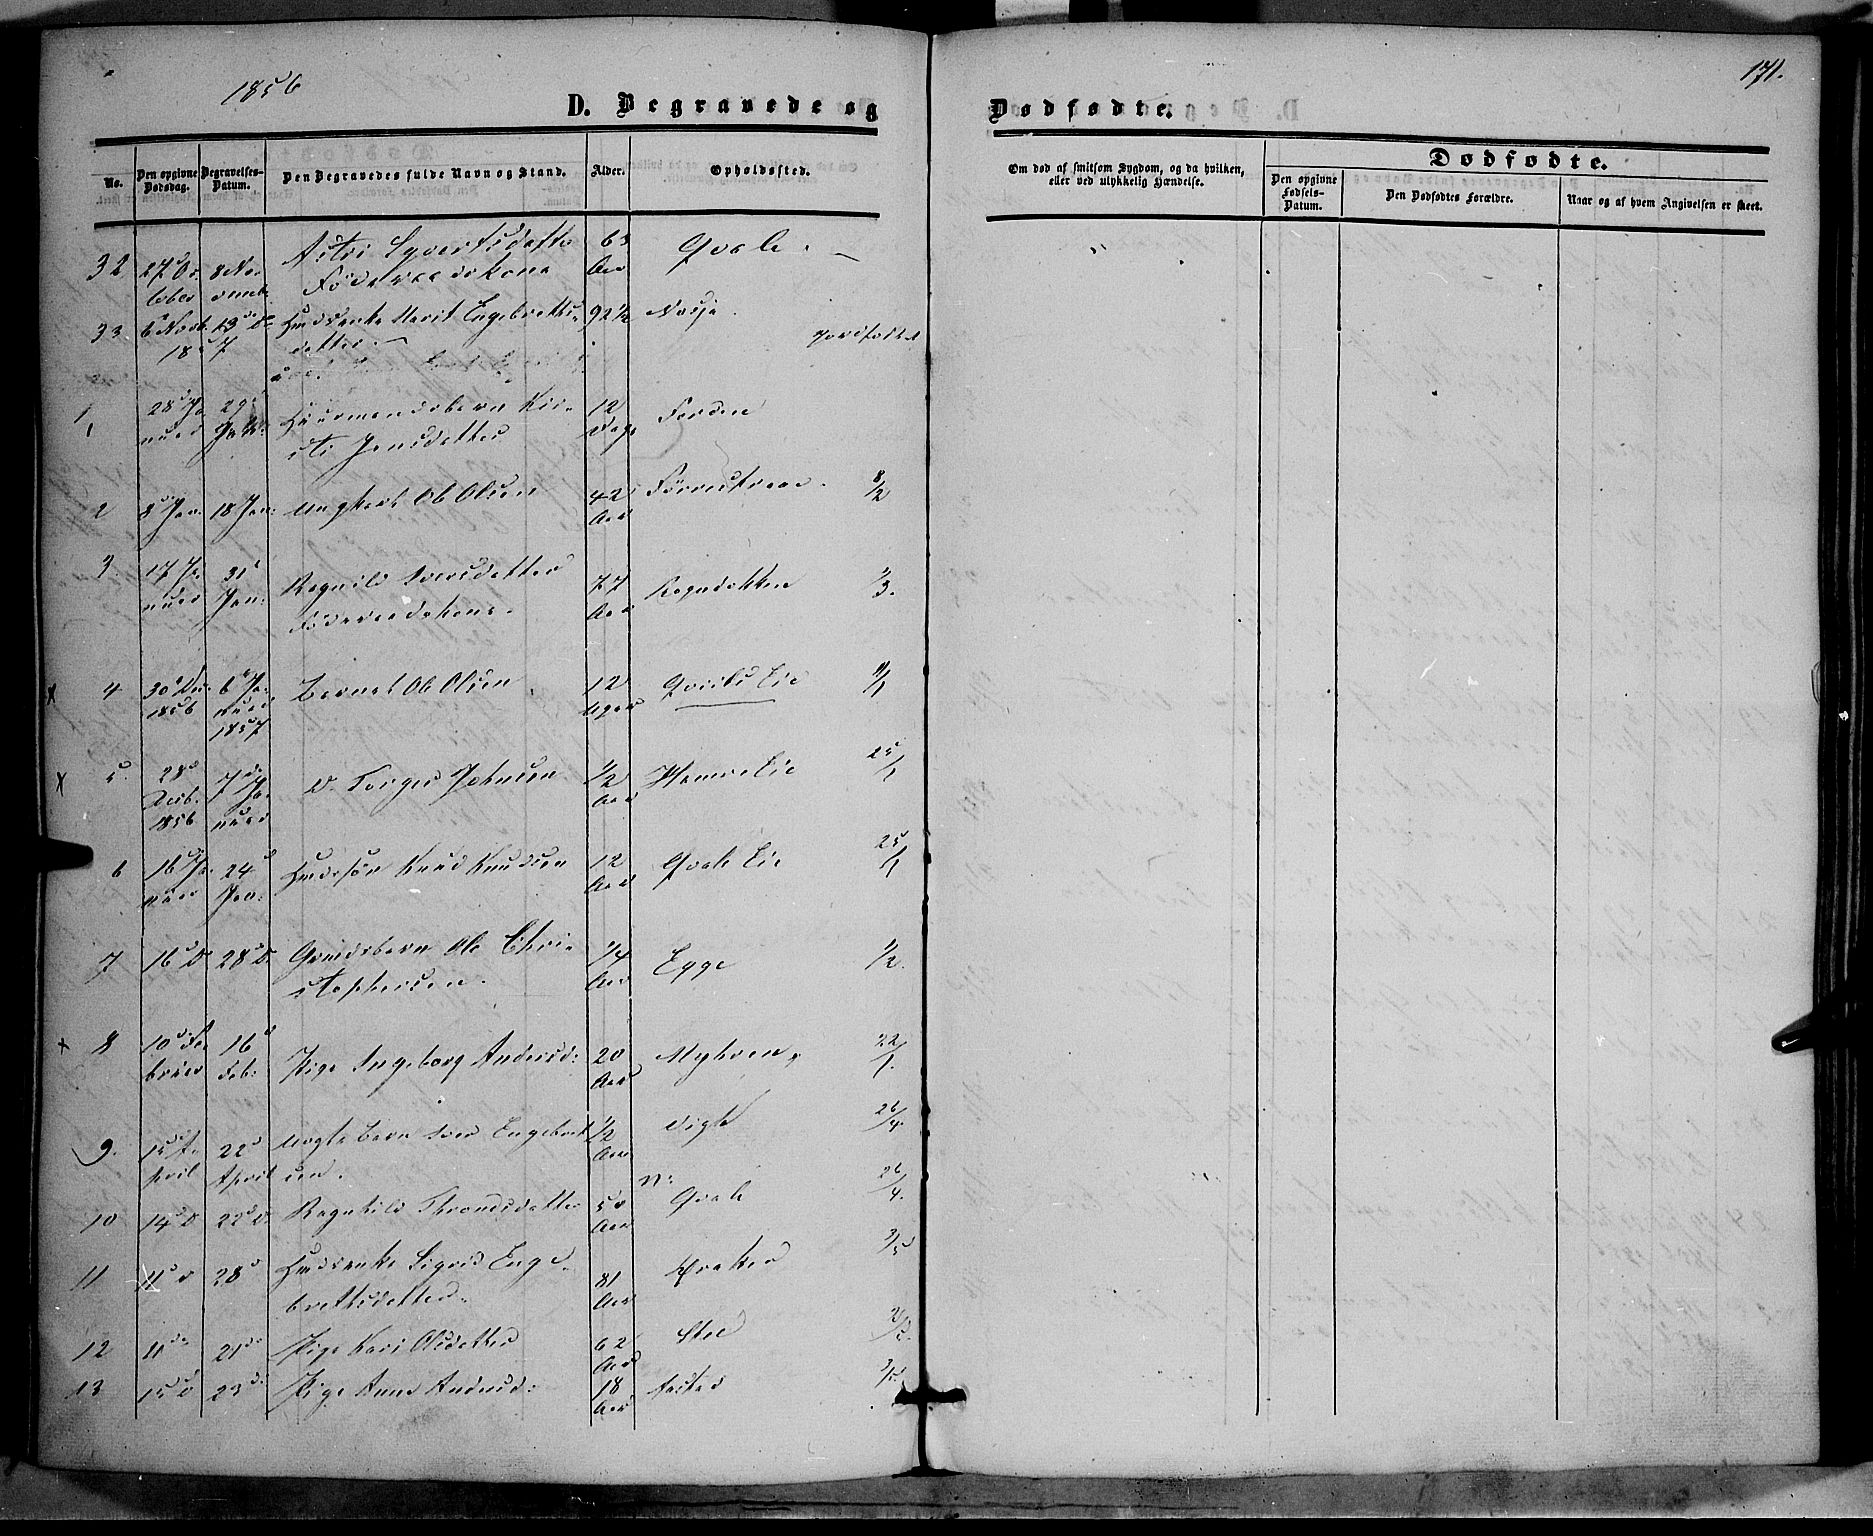 SAH, Vestre Slidre prestekontor, Ministerialbok nr. 2, 1856-1864, s. 171